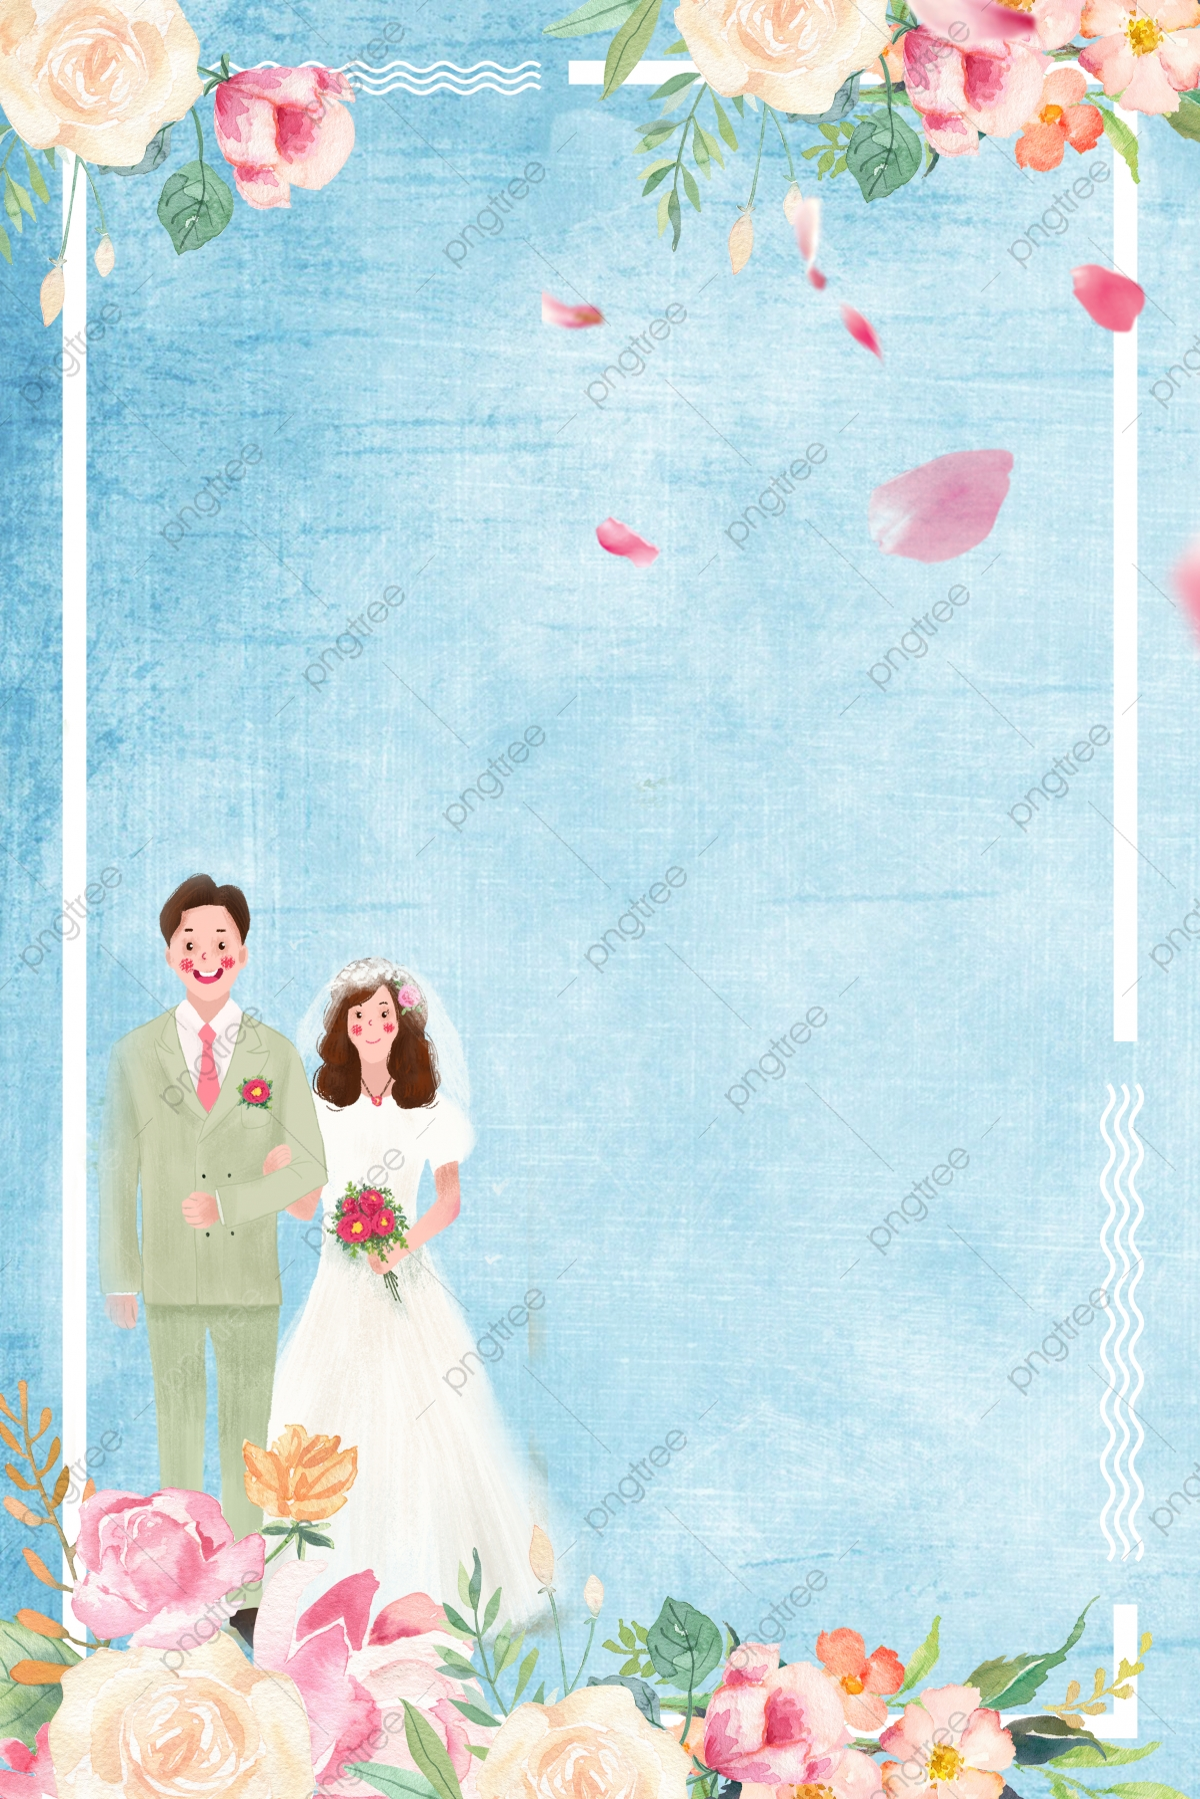 Wedding Invitation Fresh Blue Invitation Card Fresh Wedding Invitation Invitation Poster Background Wedding Background Image For Free Download